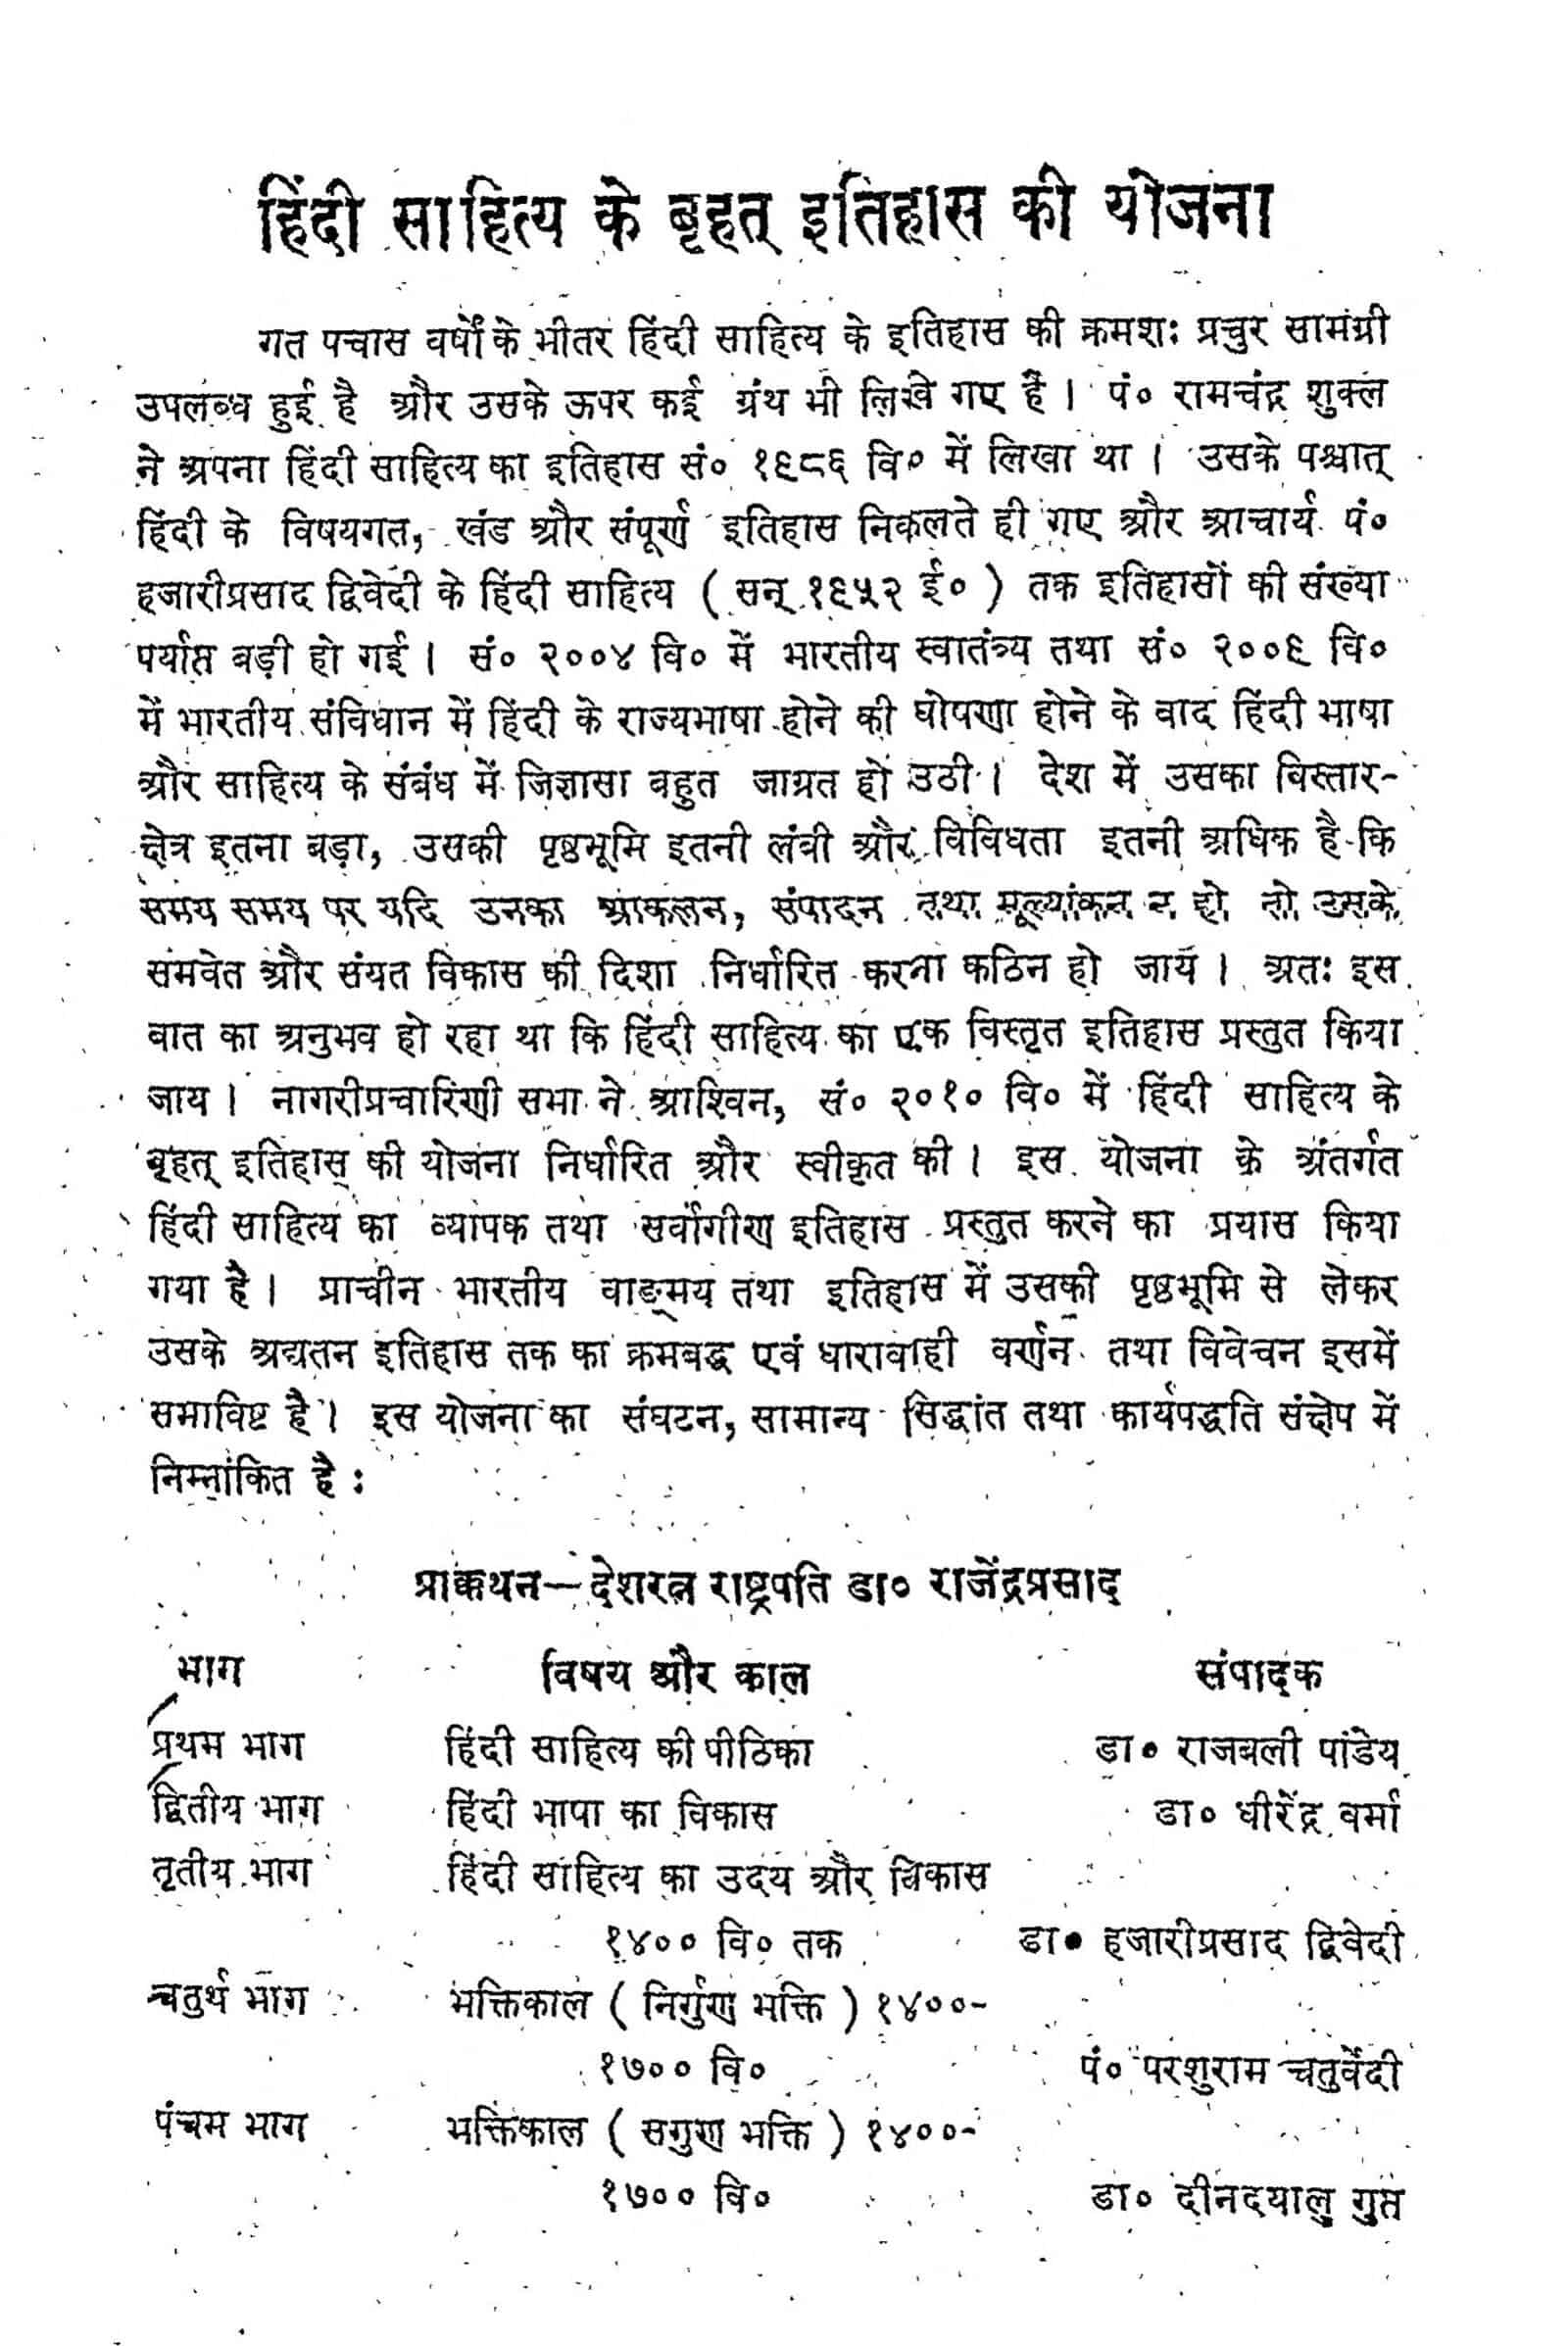 Book Image : हिन्दी साहित्य के बृहत इतिहास भाग 6 - Hindi Sahitya Ka Brahid Itihas Bhag 6